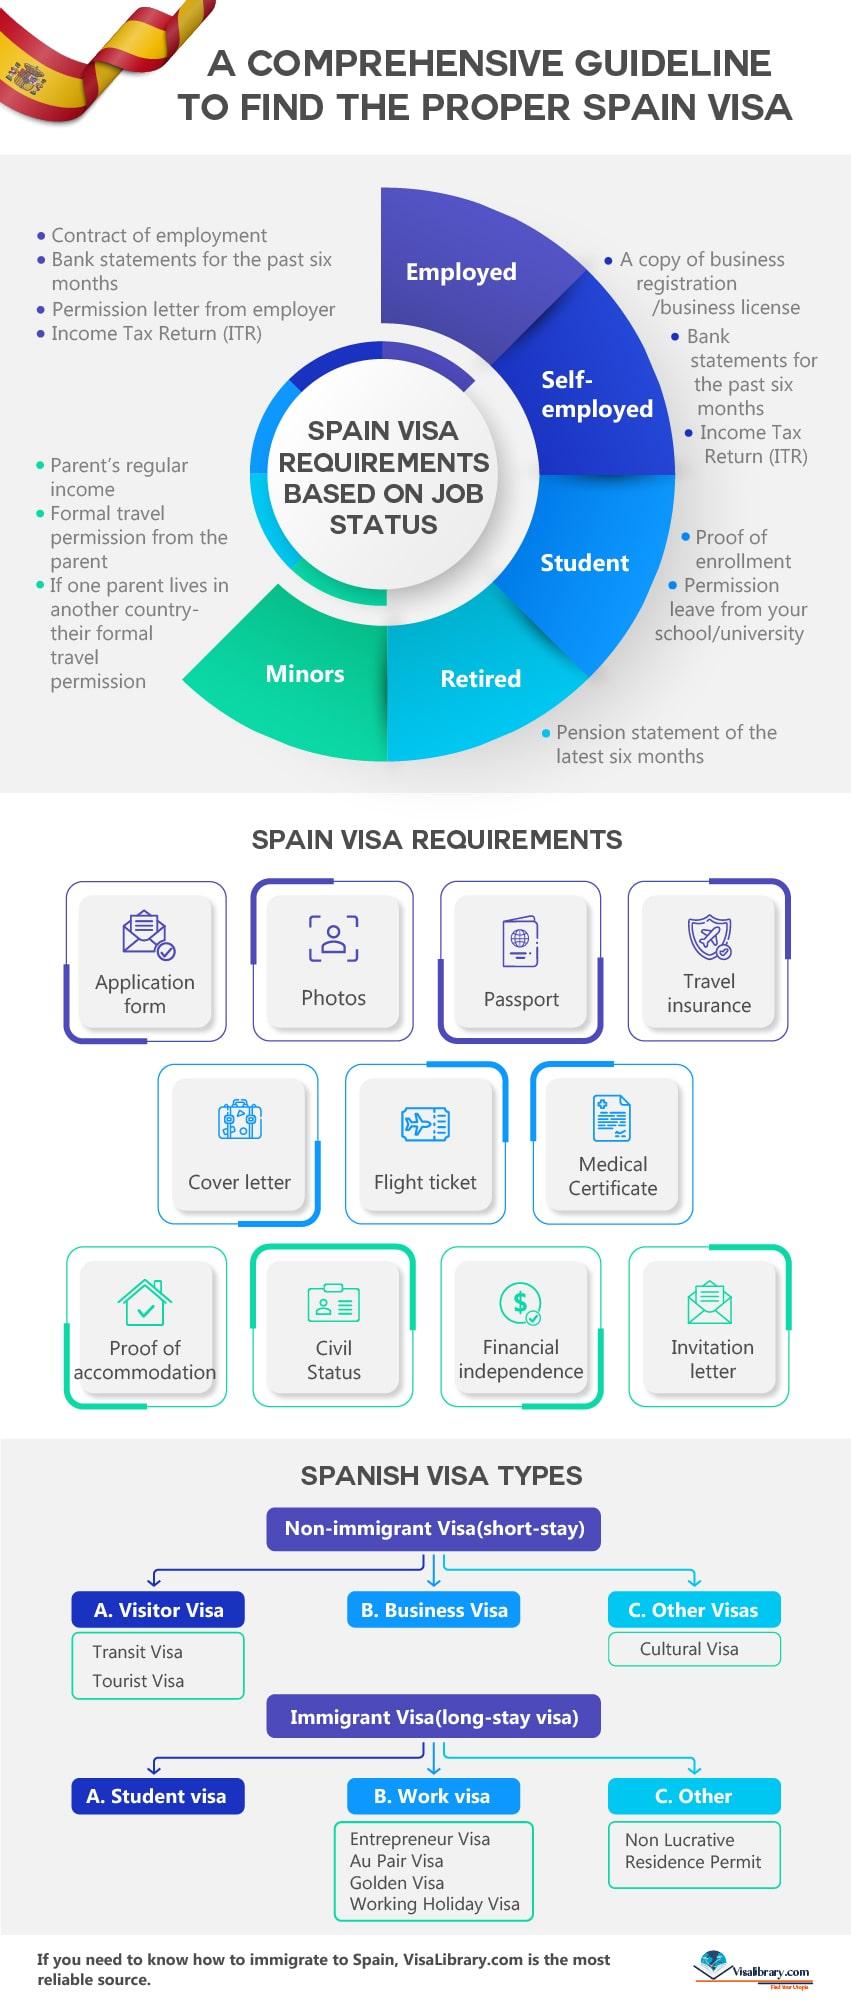 A Comprehensive Guideline to Find the Proper Spain Visa